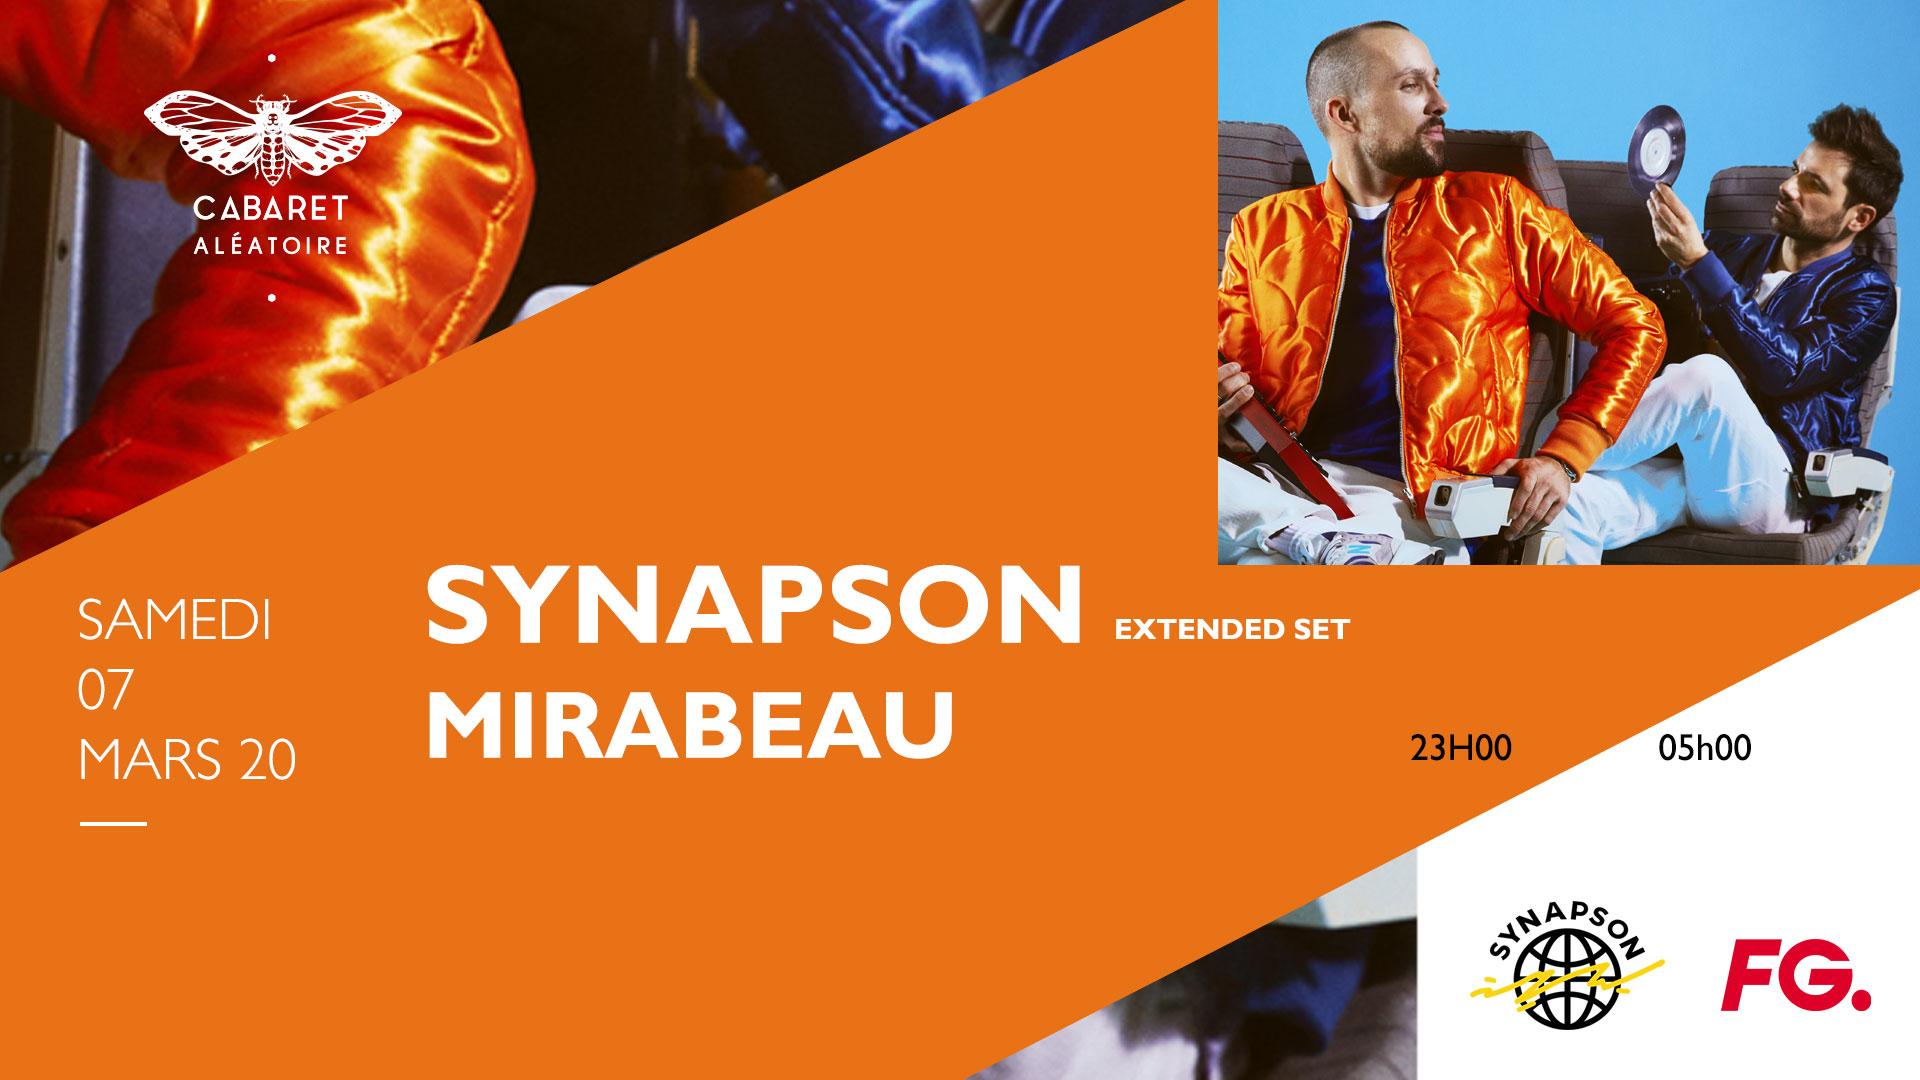 SYNAPSON [EXTENDED SET] + MIRABEAU